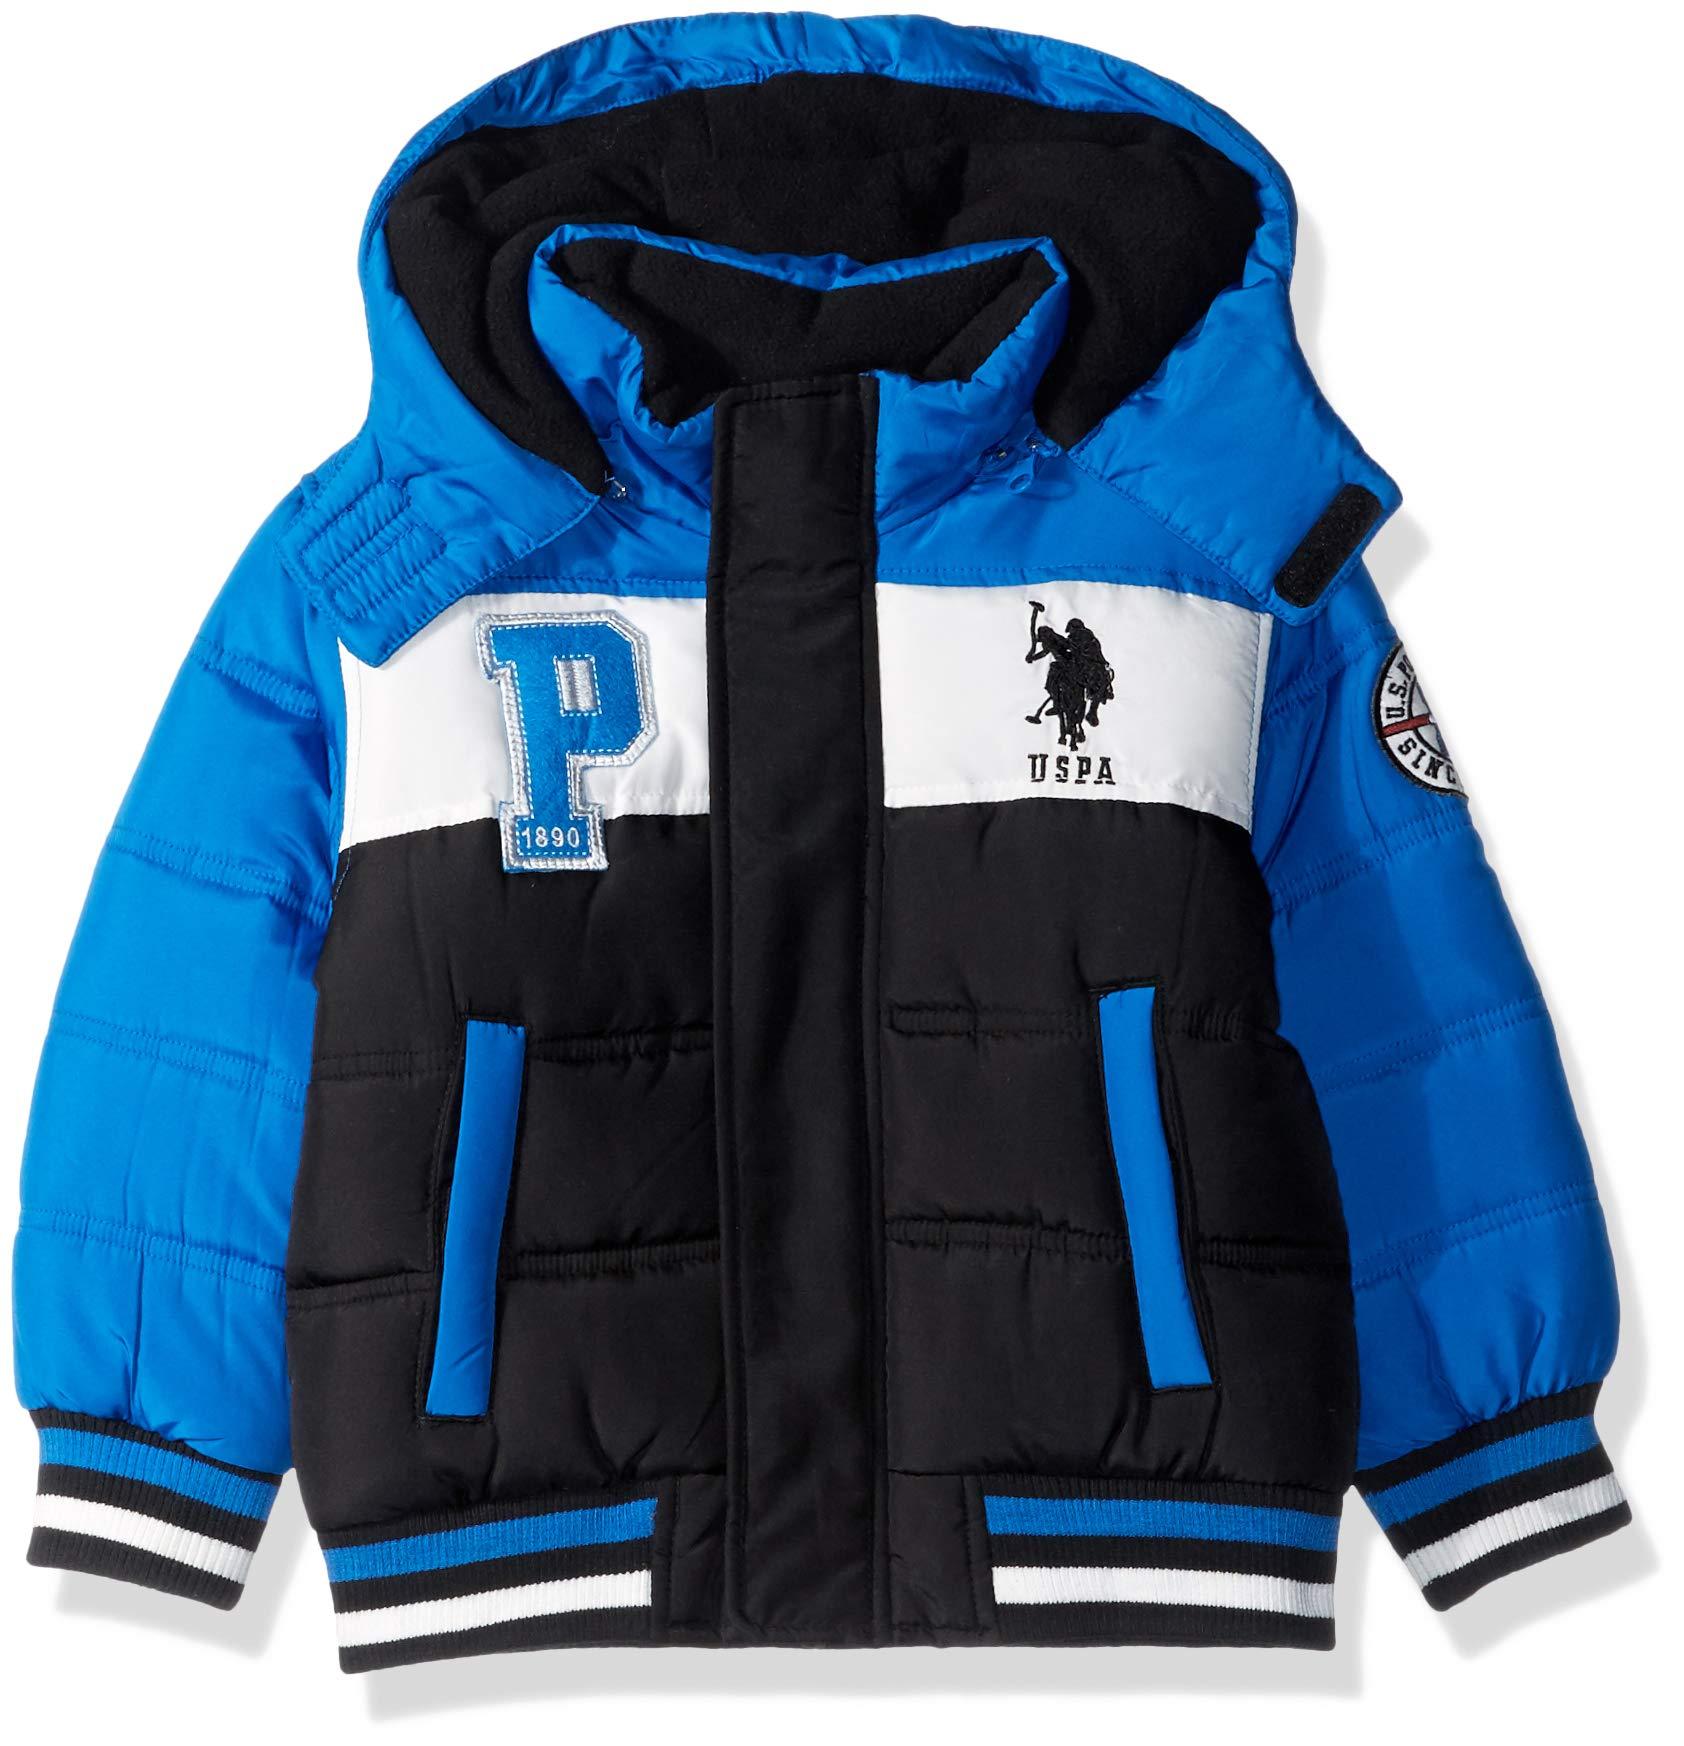 US Polo Association Boys' Big Bubble Jacket with Rib Knit Cuffs, Black/Blue Tile, 8 by U.S. Polo Assn. (Image #1)